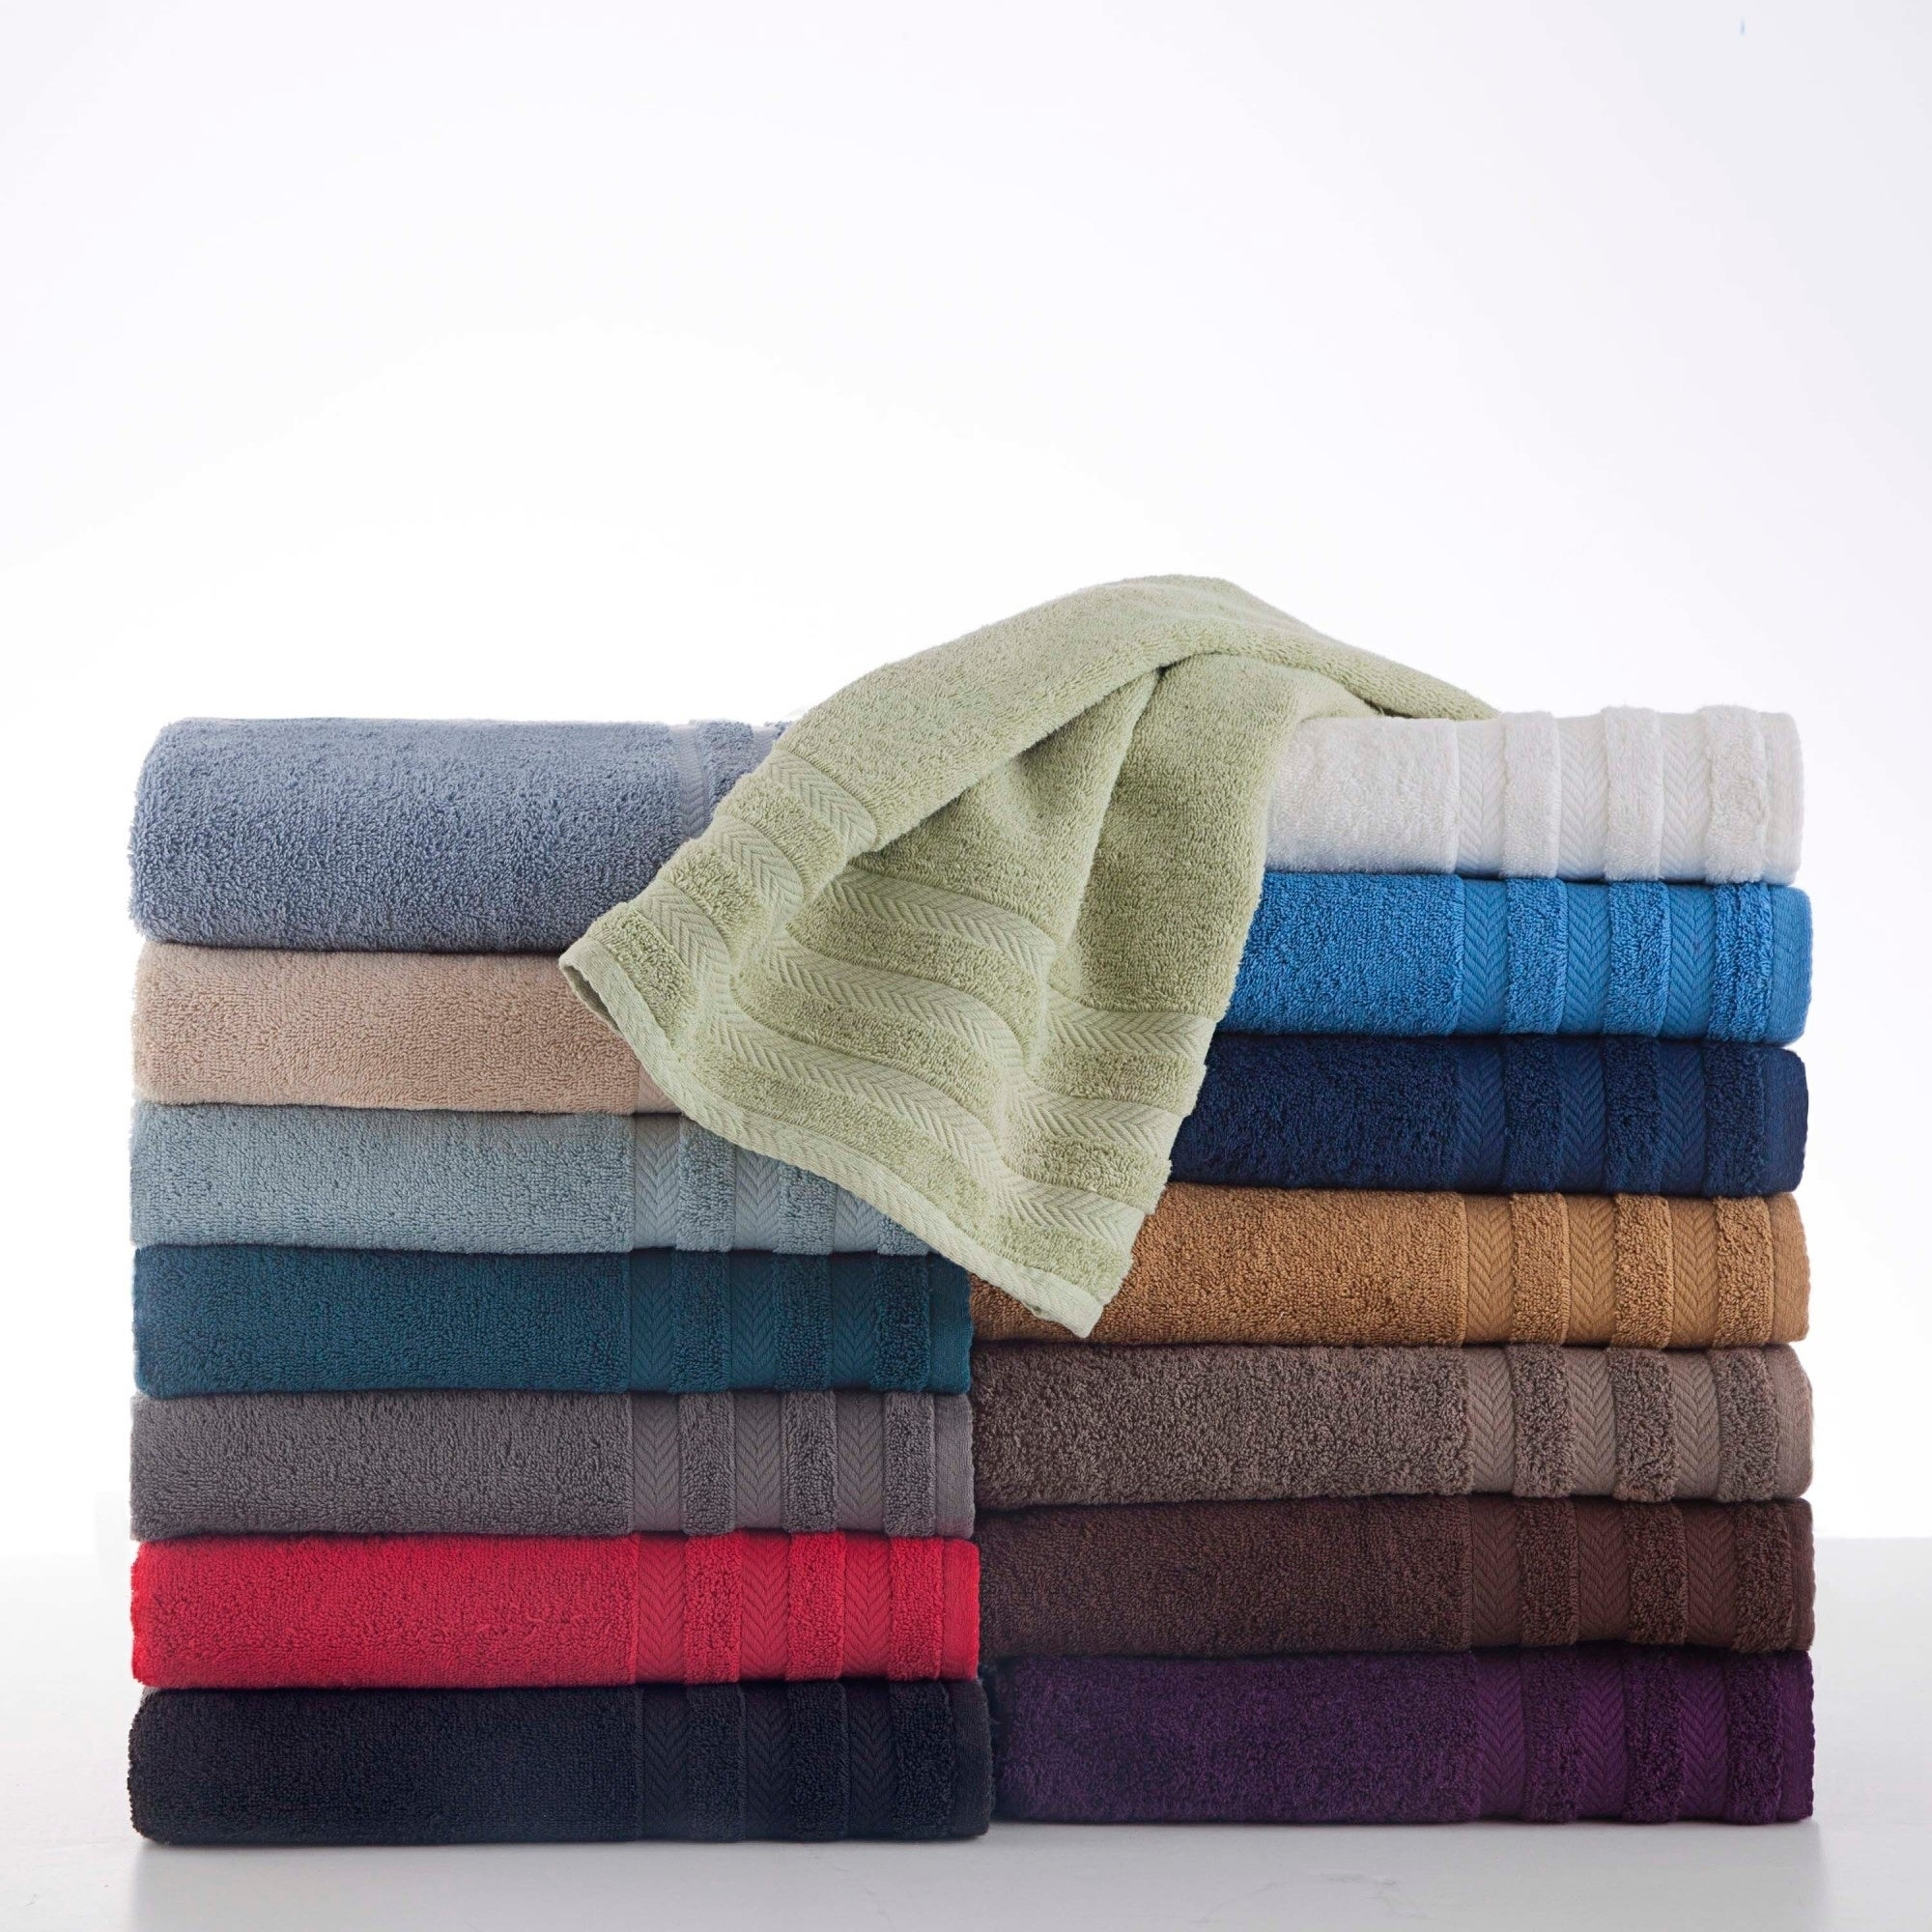 77c44fae04b6 Shop Copper Grove Steinmetz Egyptian Cotton Towel Set - On Sale ...